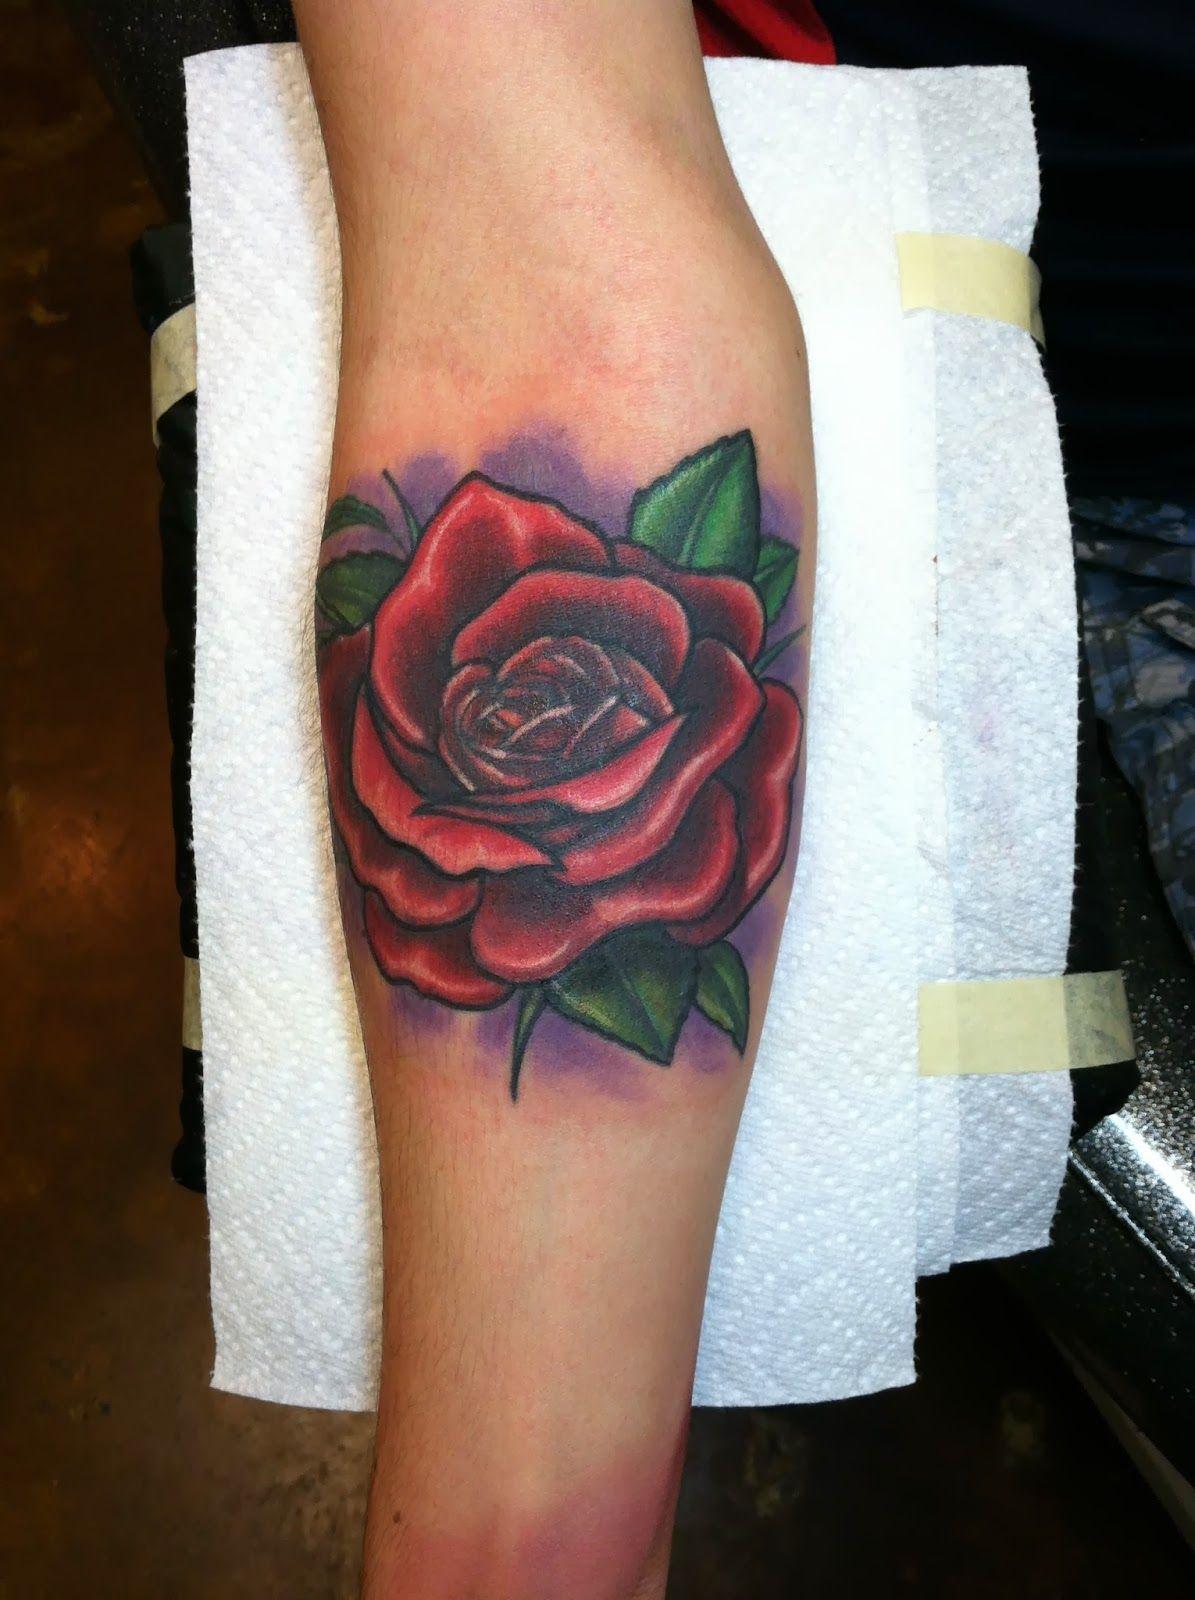 Rose Forearm Tattoo by David Meek Tattoos at Fast Lane Tattoo in ...